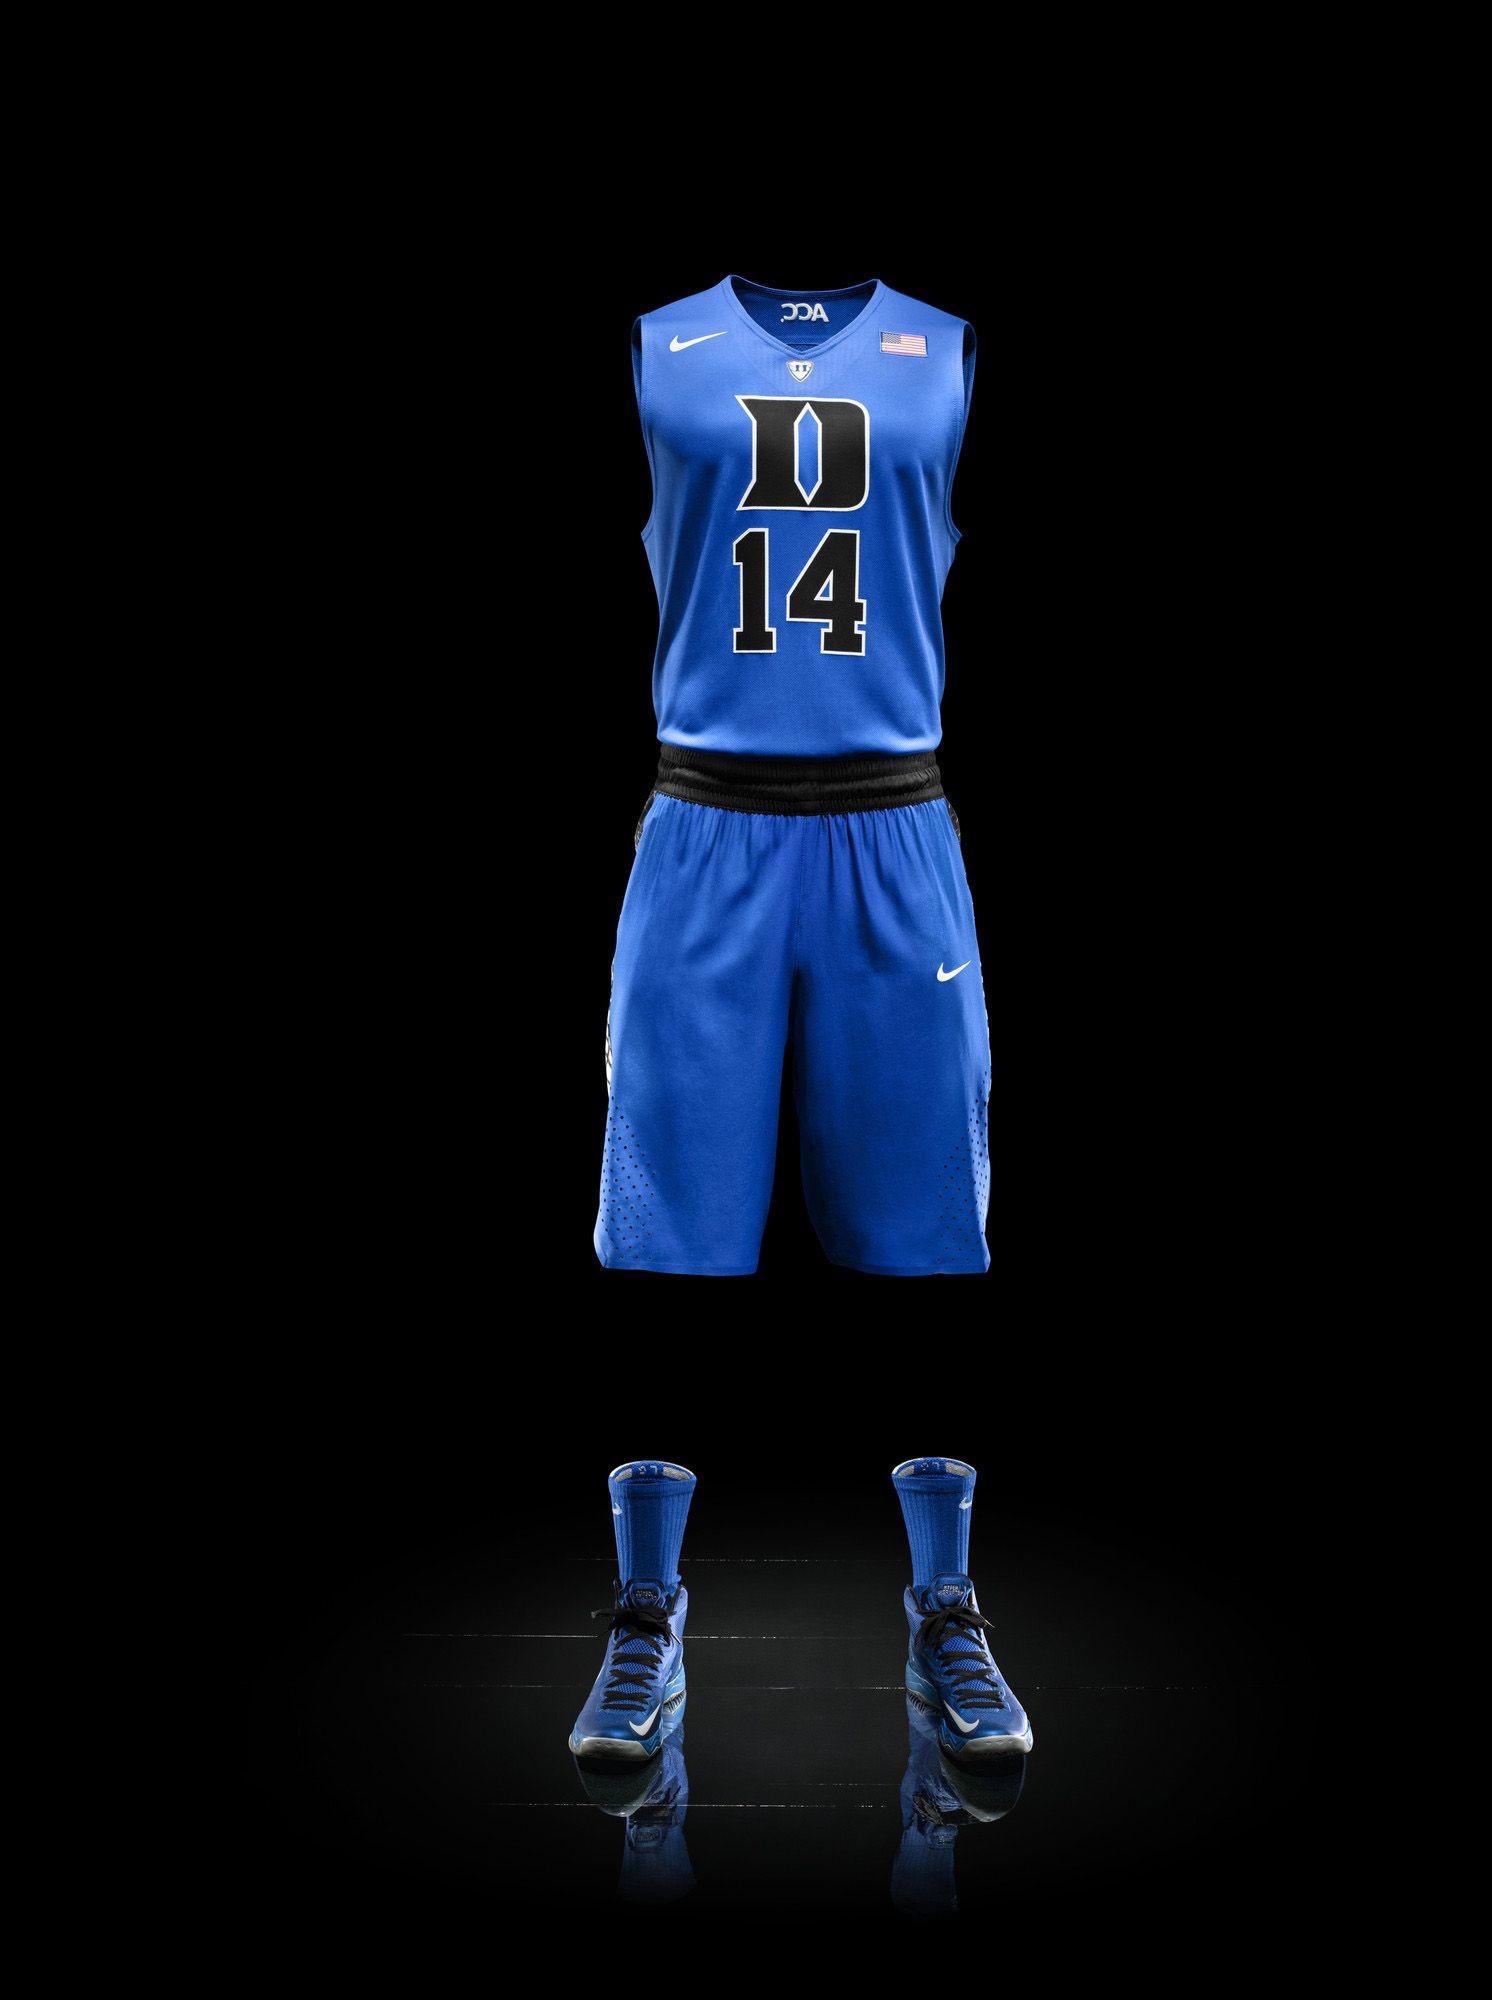 Res: 1492x2000, Nike Basketball Uniforms   ... uniforms duke 5 687x920 Nike Hyper 2013  Elite Road